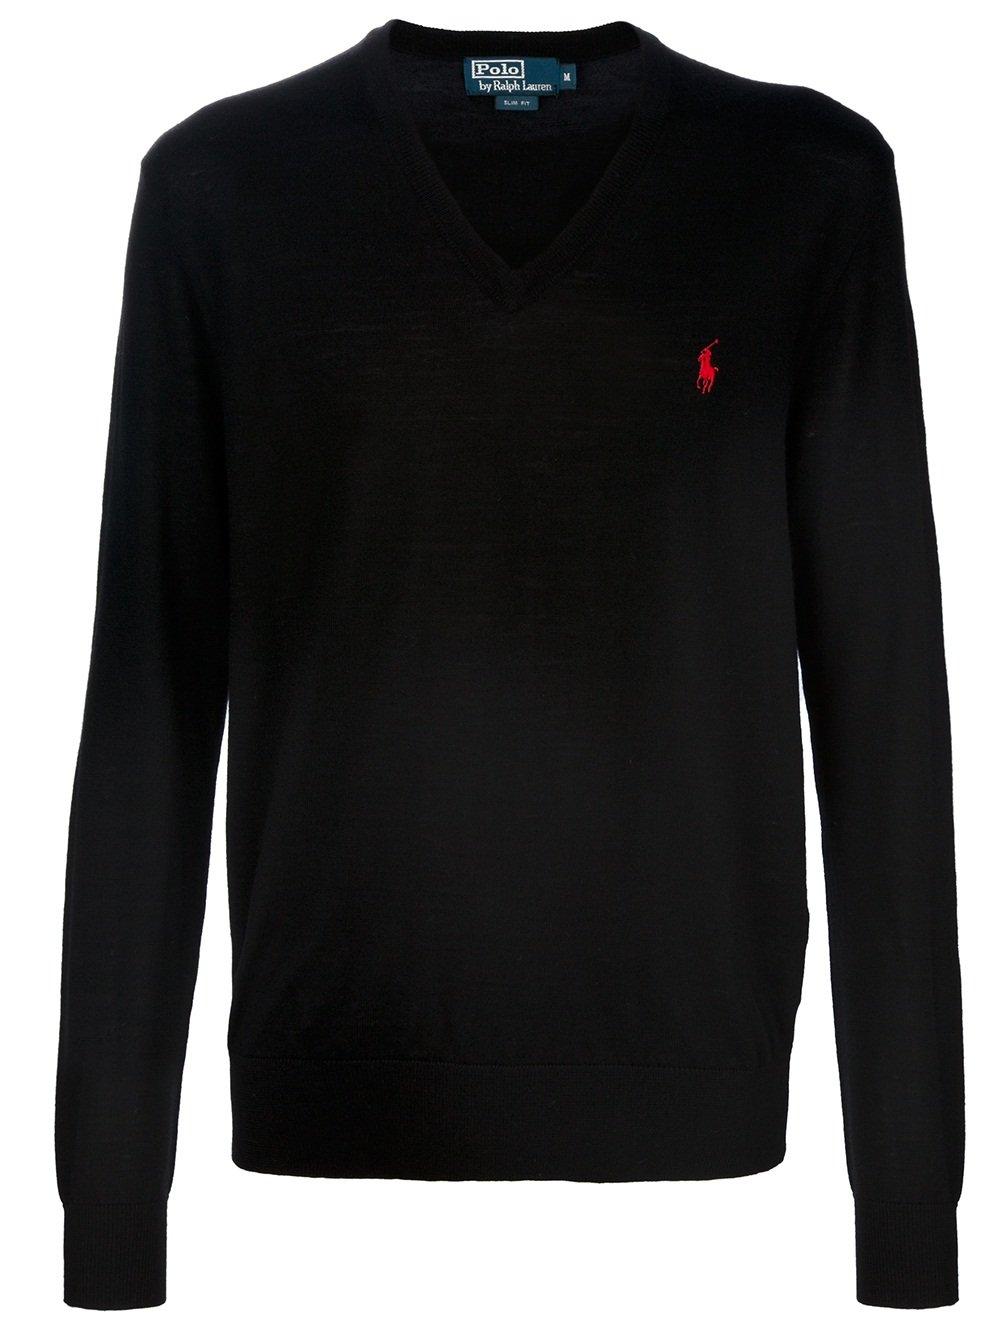 POLO U.S ASSN. Men's Sweater (Large) Black